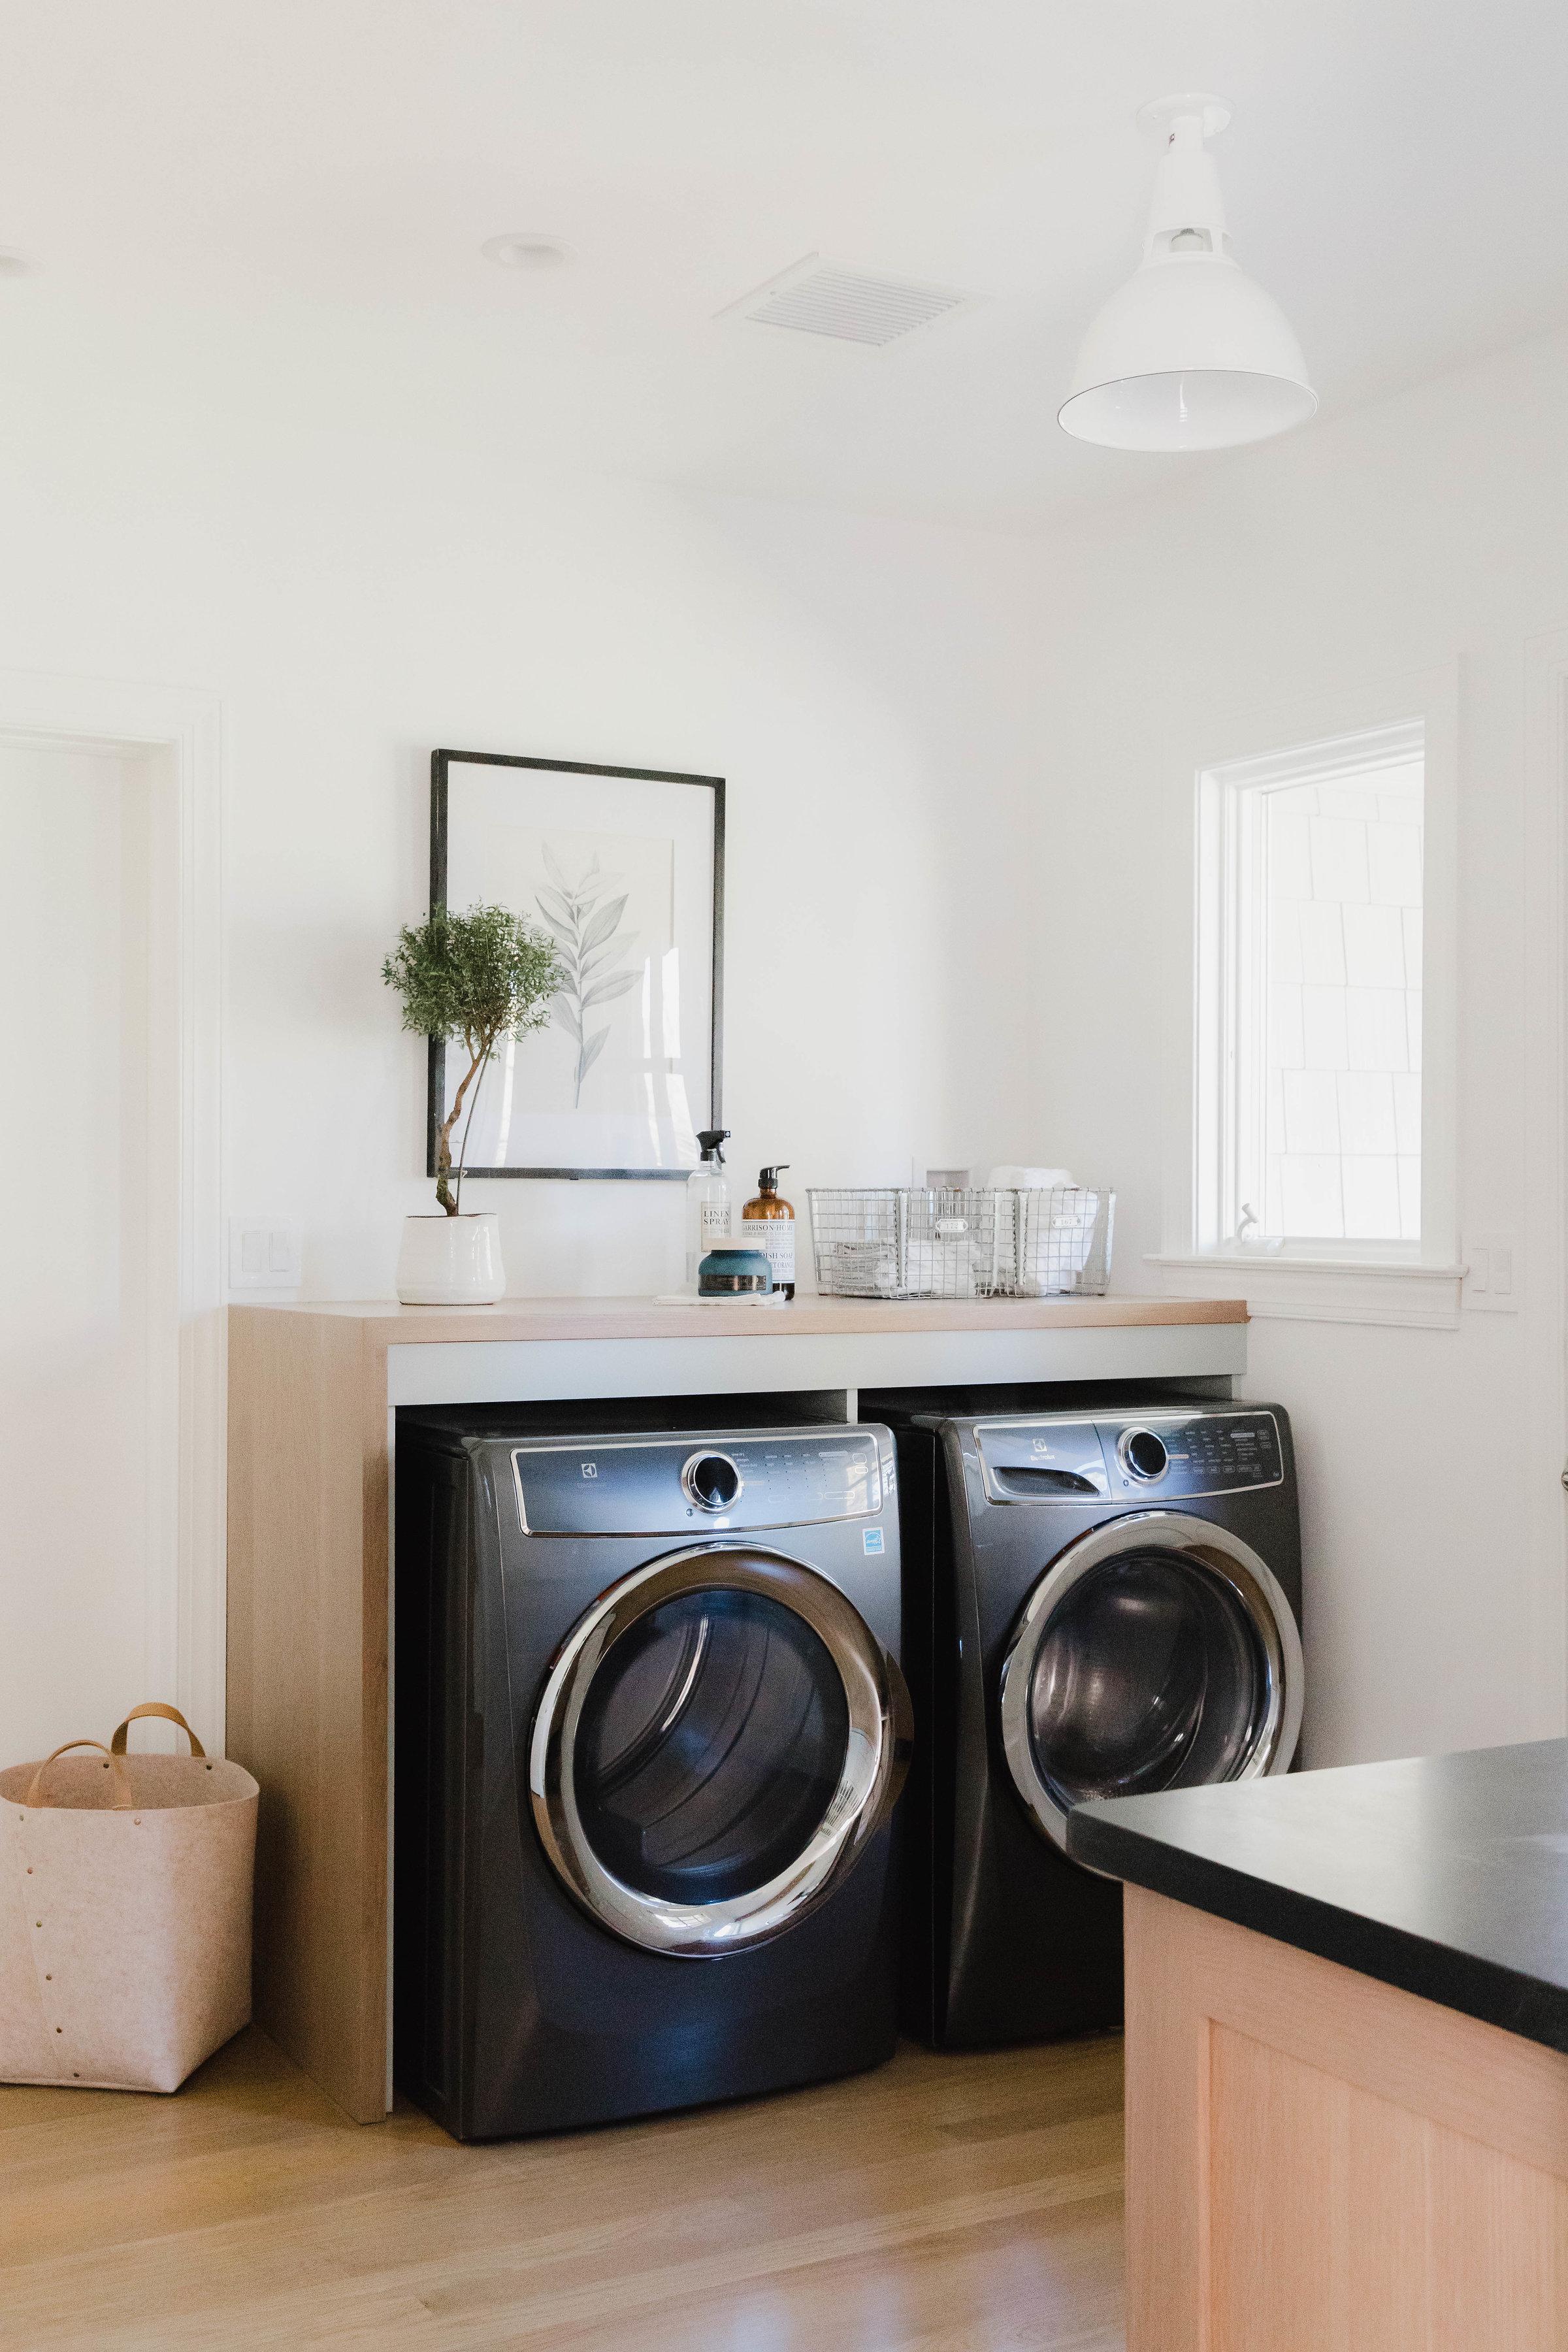 Woodpond Road Laundry - Rehabitat